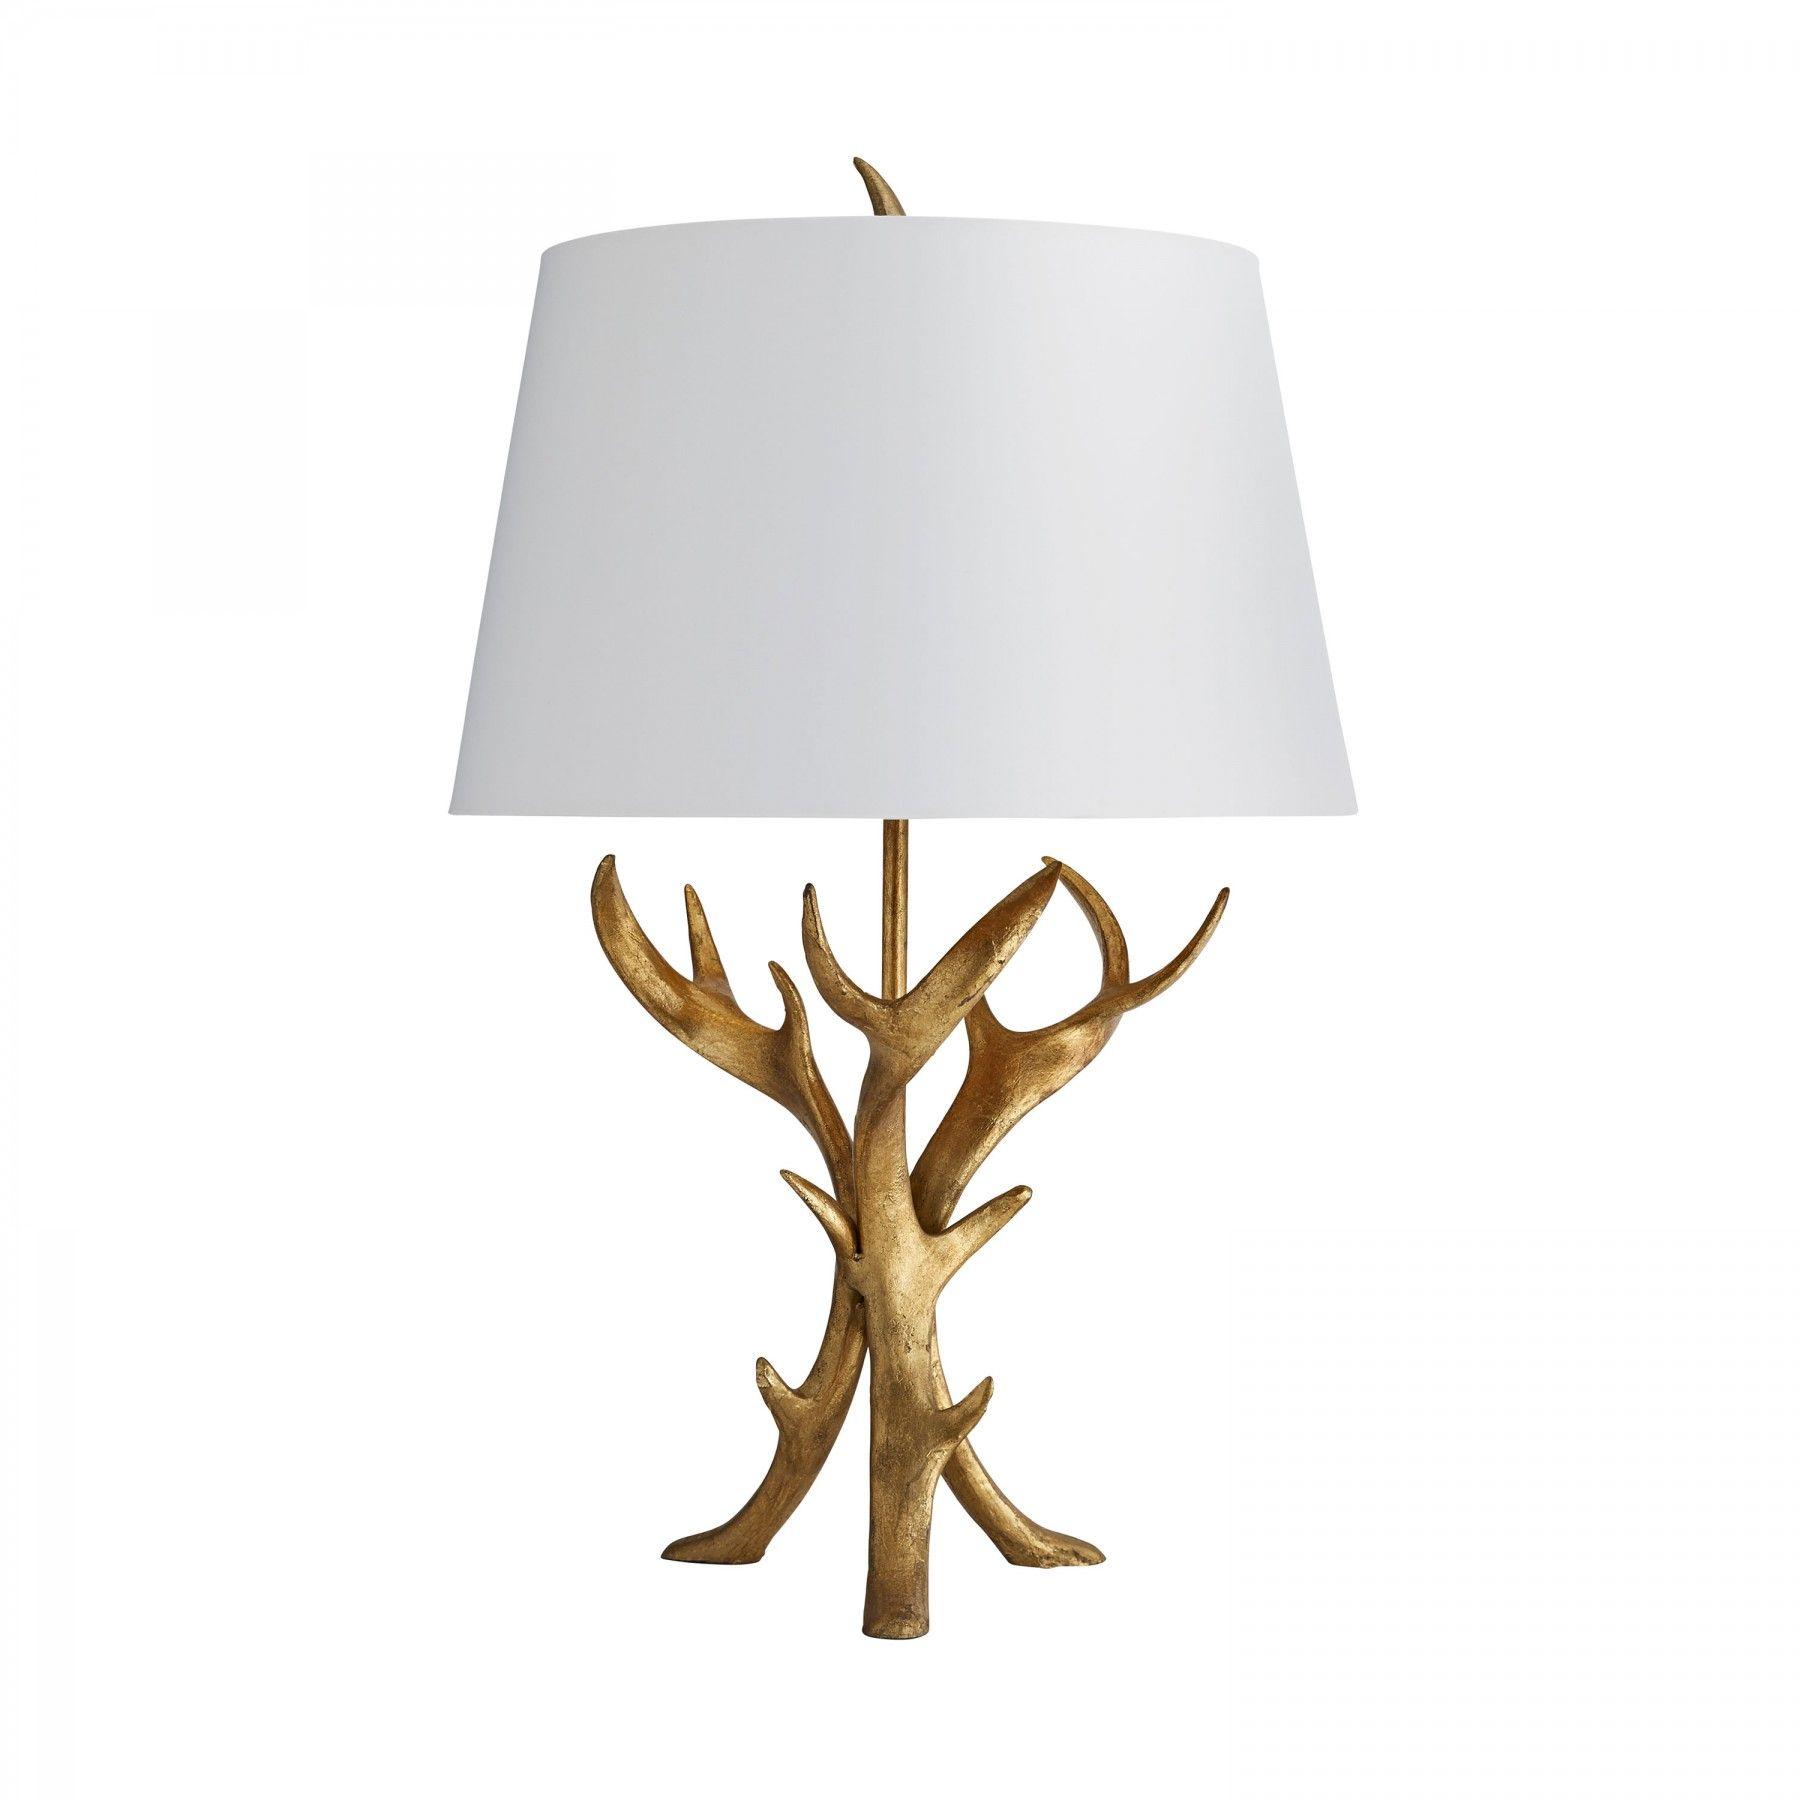 Buck Lamp New Lighting Lighting Shop Lamp Table Lamp Design Artisan Lamps